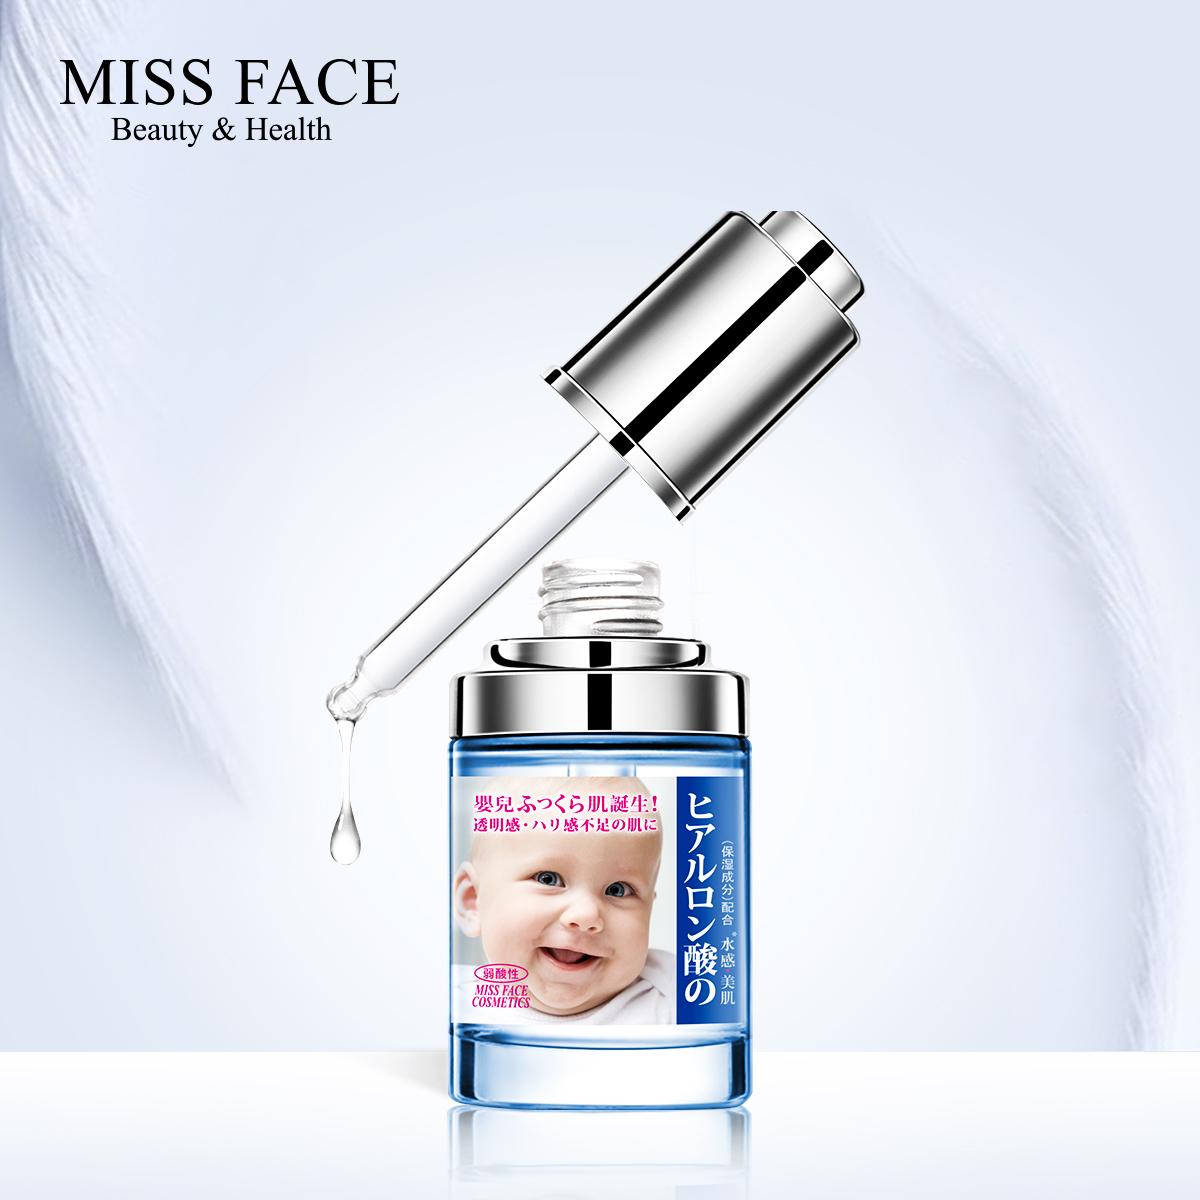 Miss face玻尿酸原液正品 补水保湿提拉紧致面部皮肤破尿酸精华液